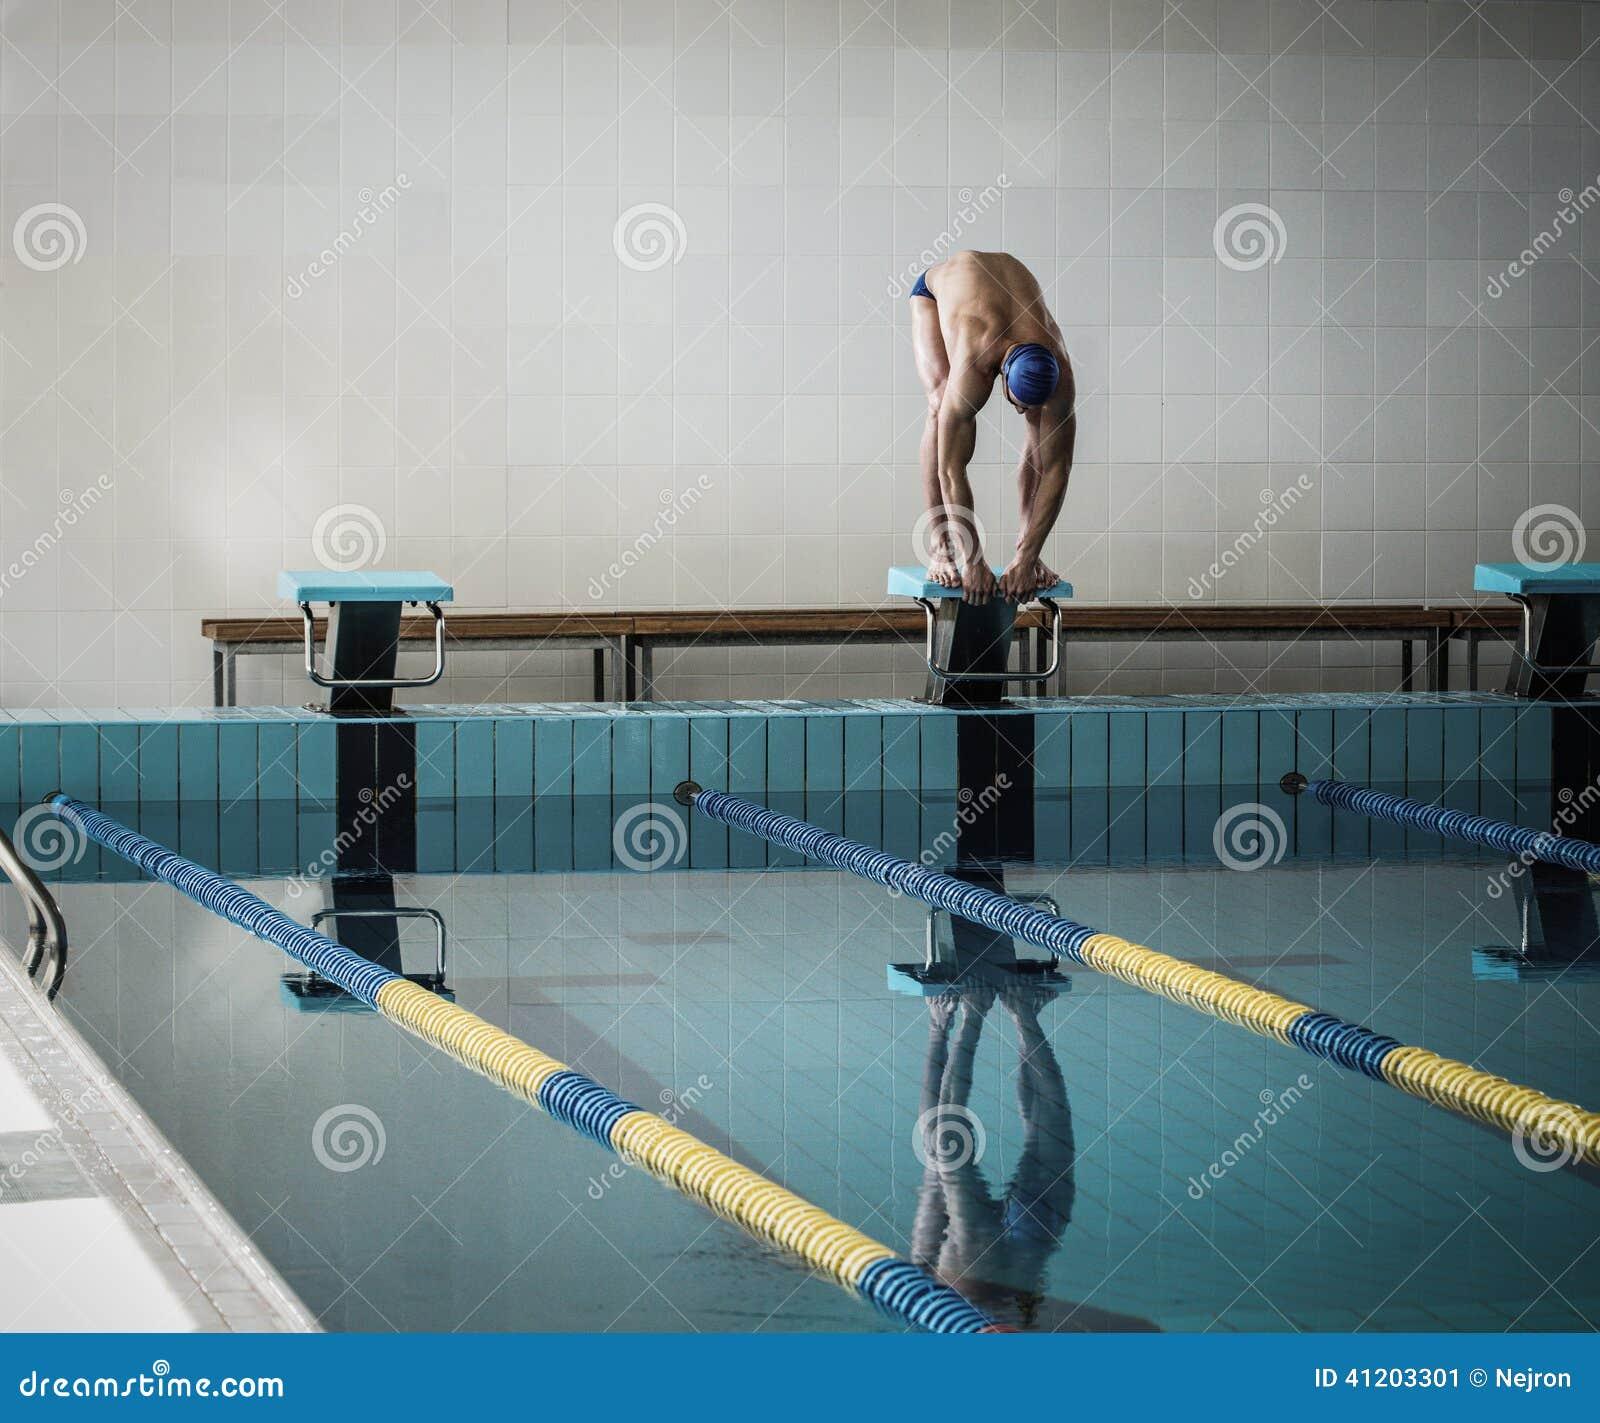 swimmer standing on starting block stock photo image 41203301. Black Bedroom Furniture Sets. Home Design Ideas